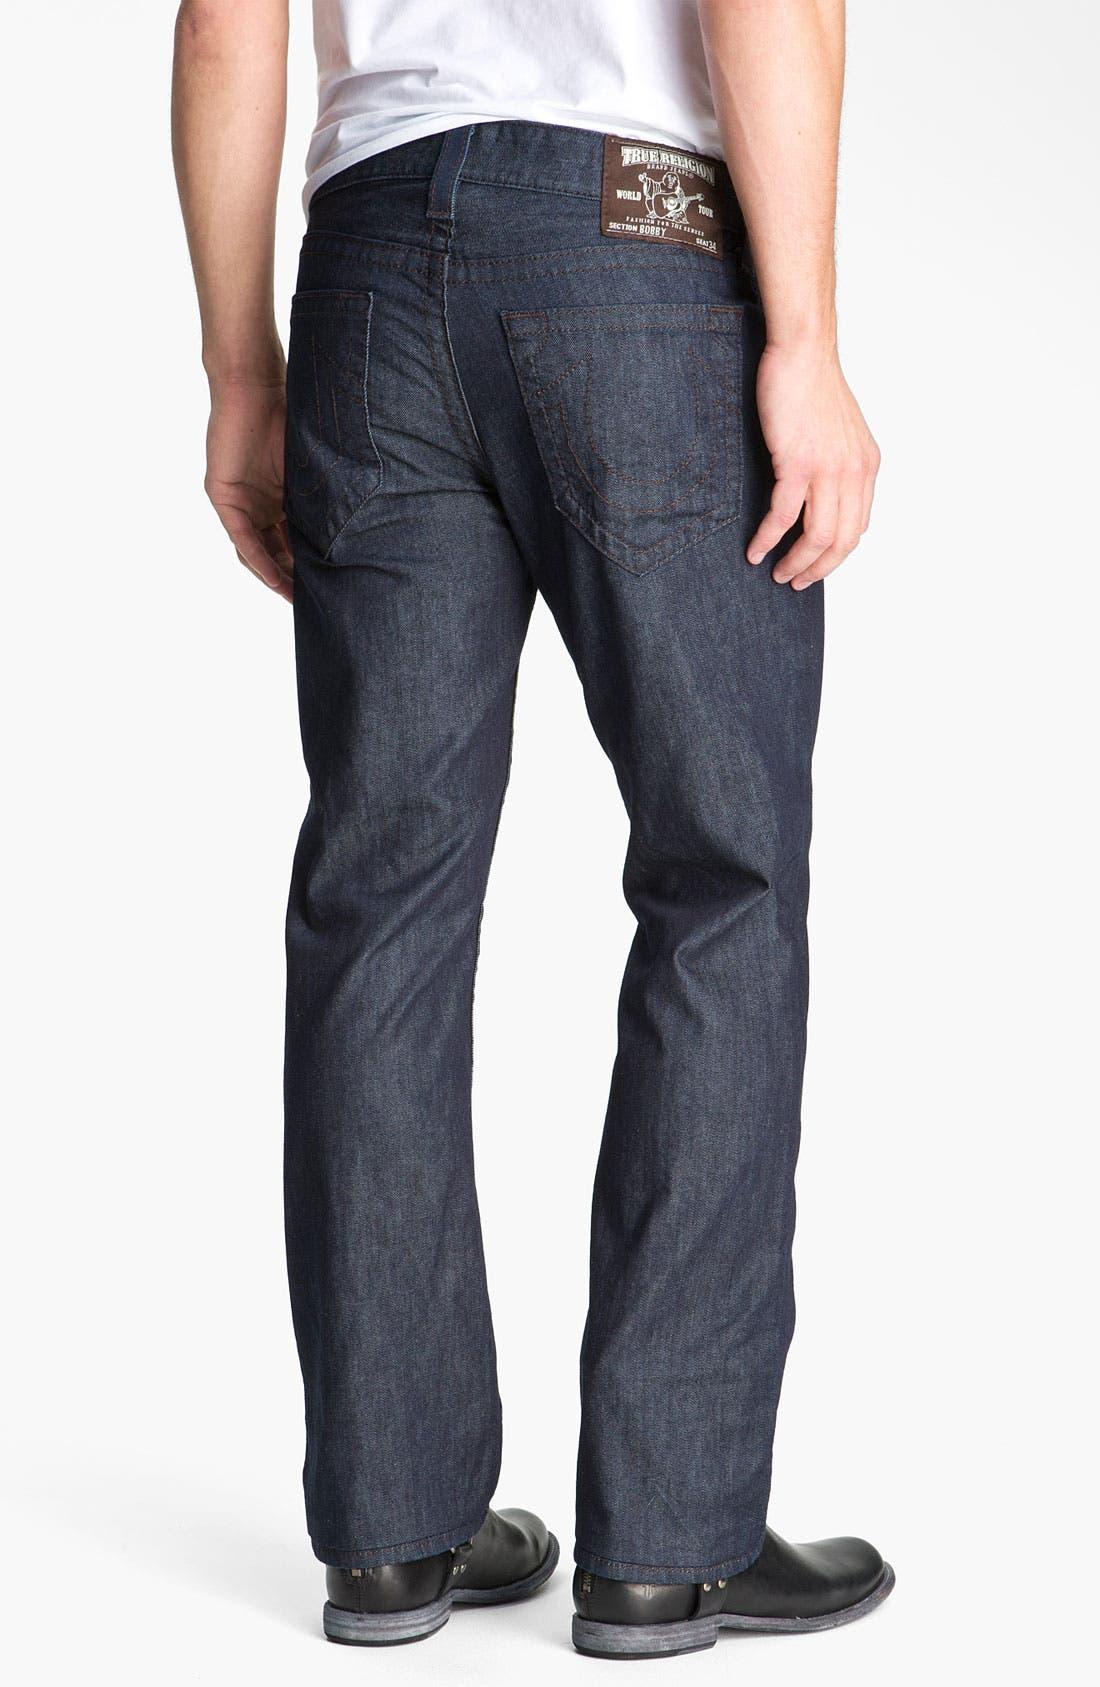 Main Image - True Religion Brand Jeans 'Bobby' Straight Leg Jeans (Bodyrinse)